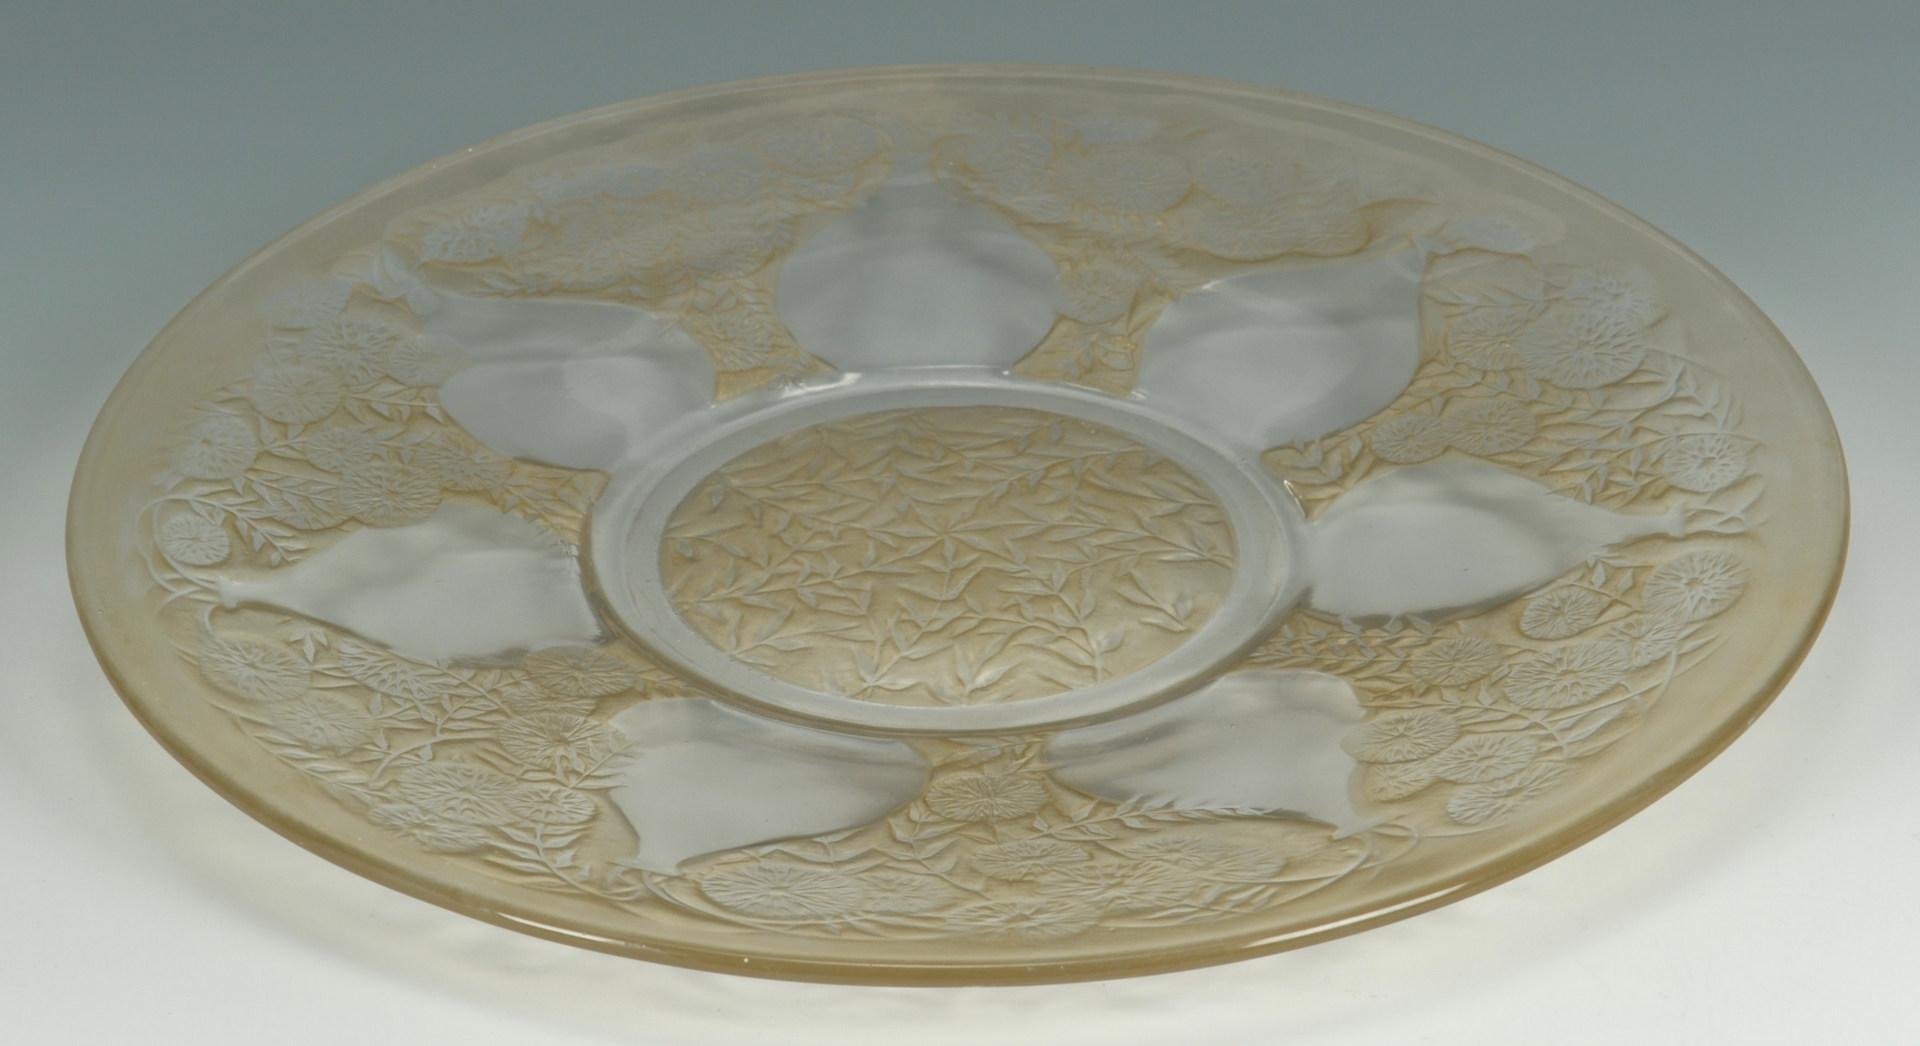 Lot 124: Lalique sepia patina platter, Vases pattern